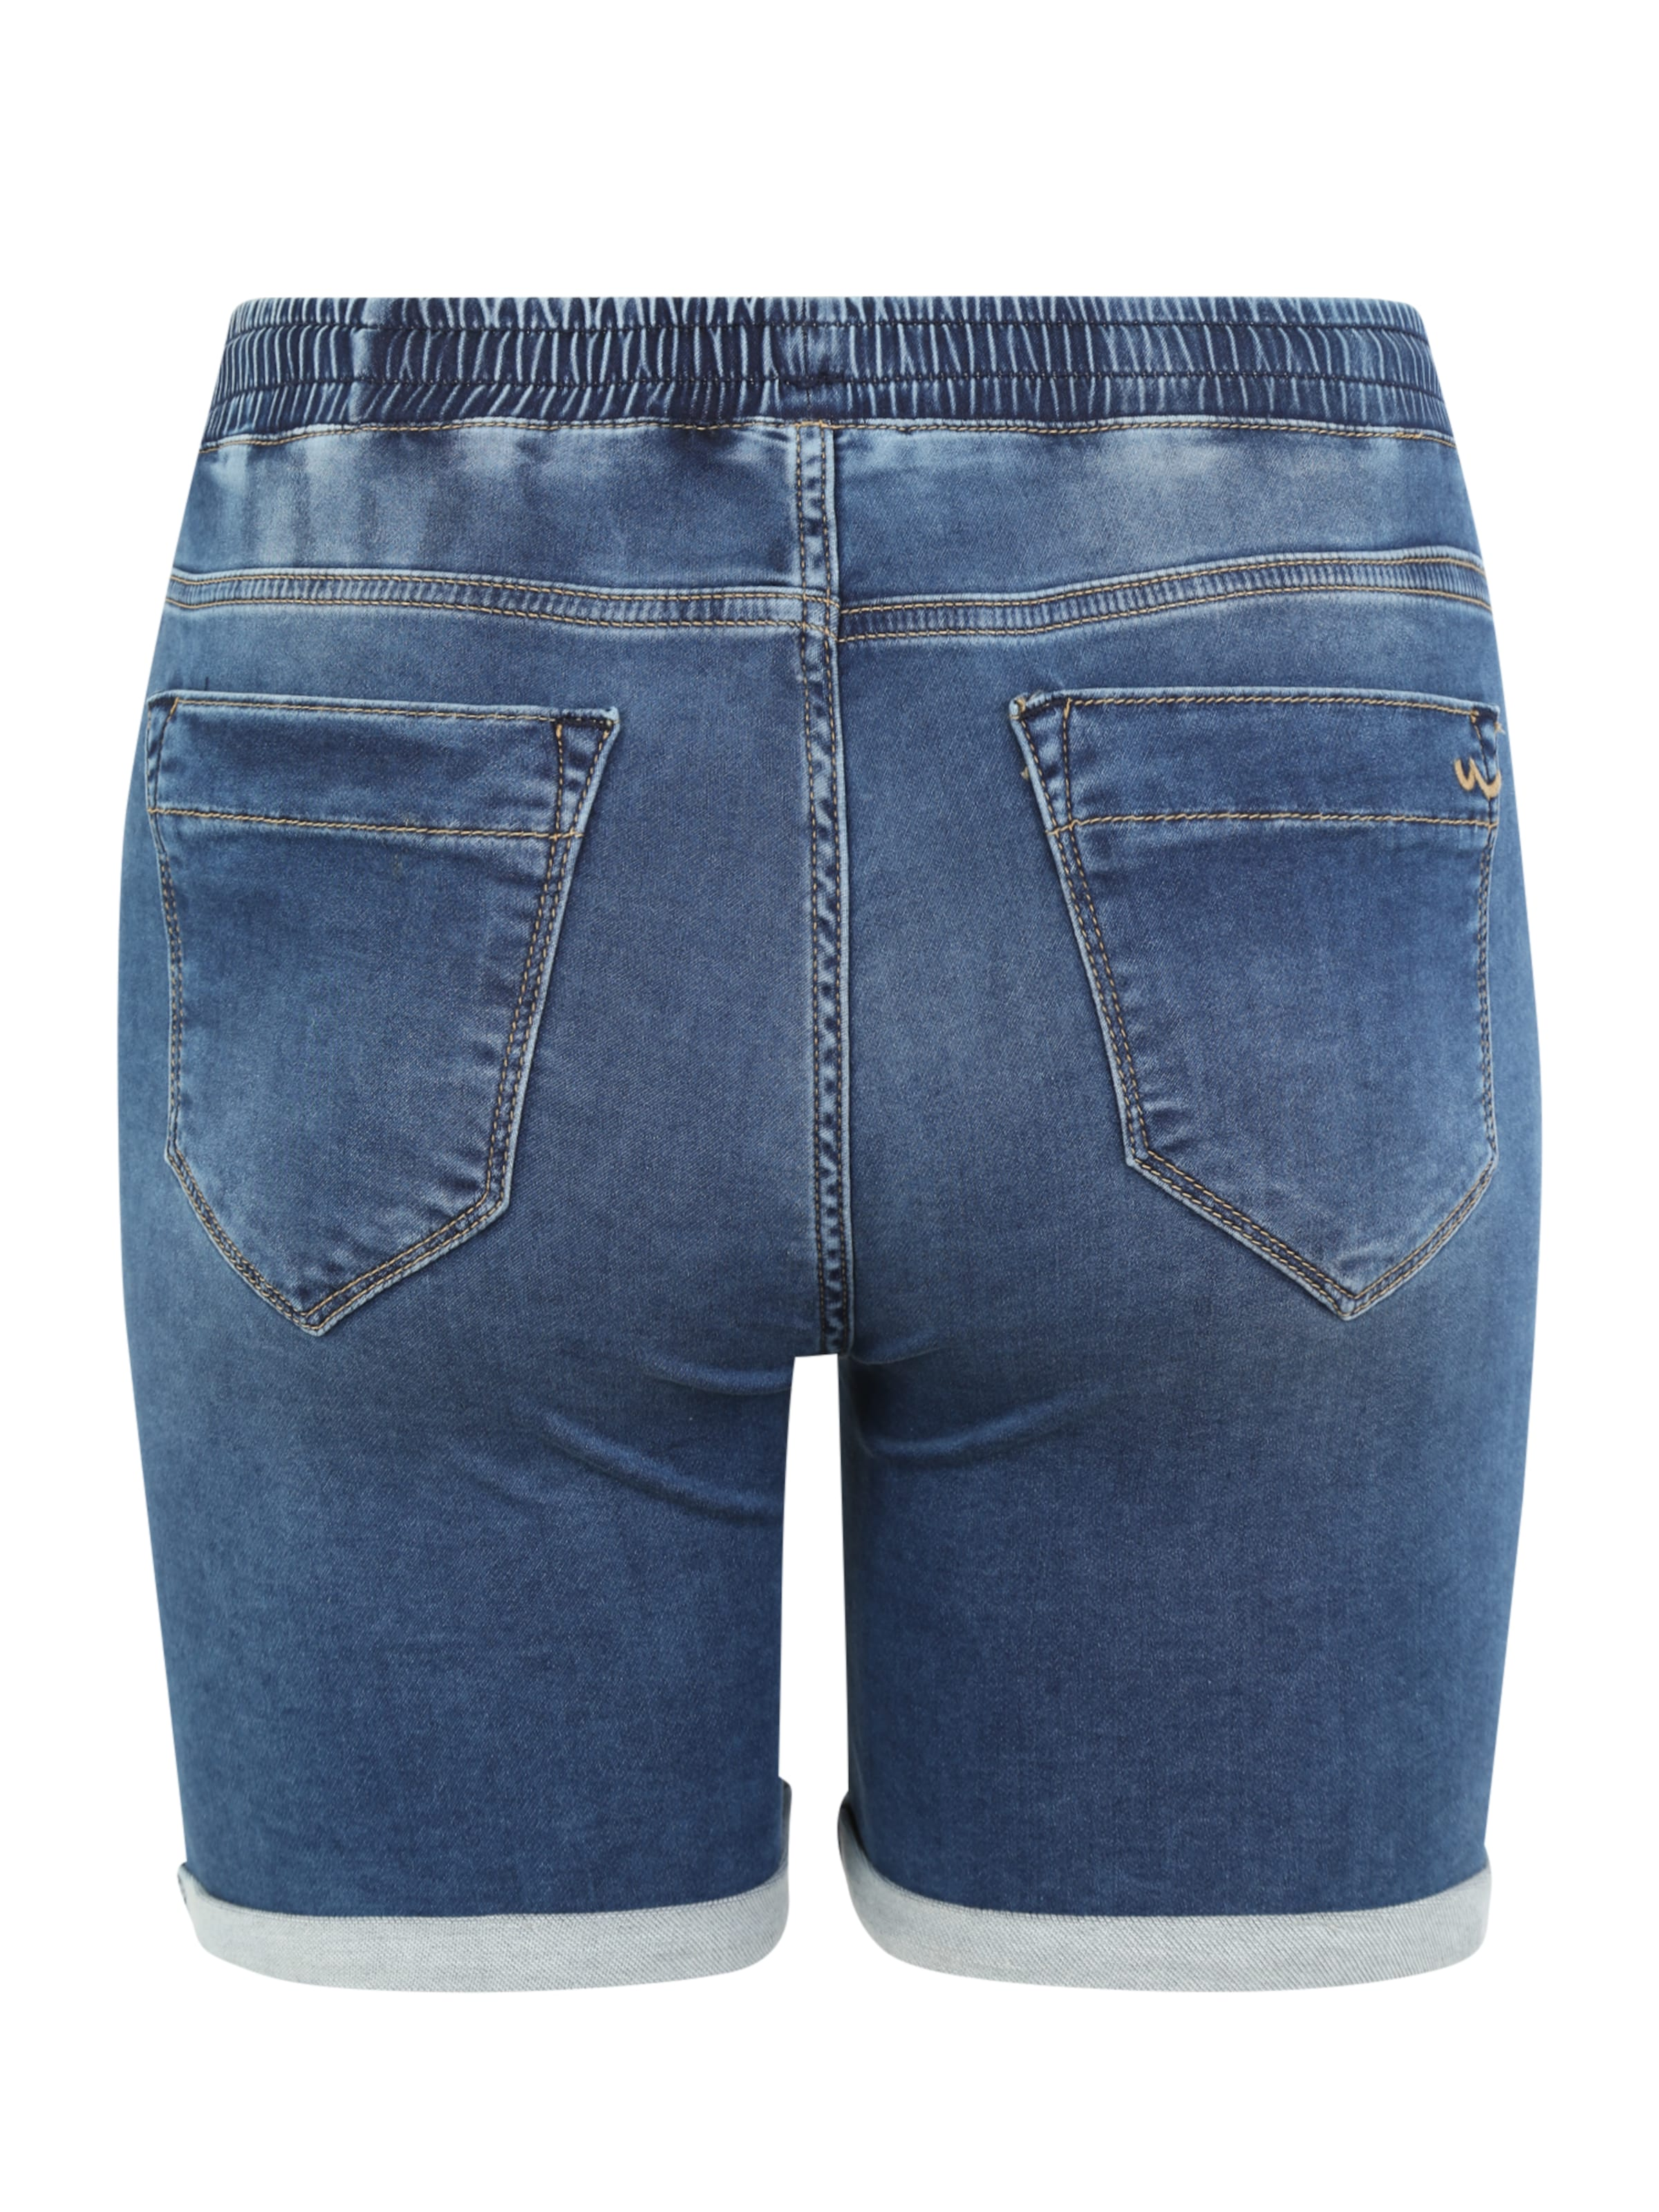 In 'arny' Denim LtbLove Jeans Be Blue To hQrsBtdxoC